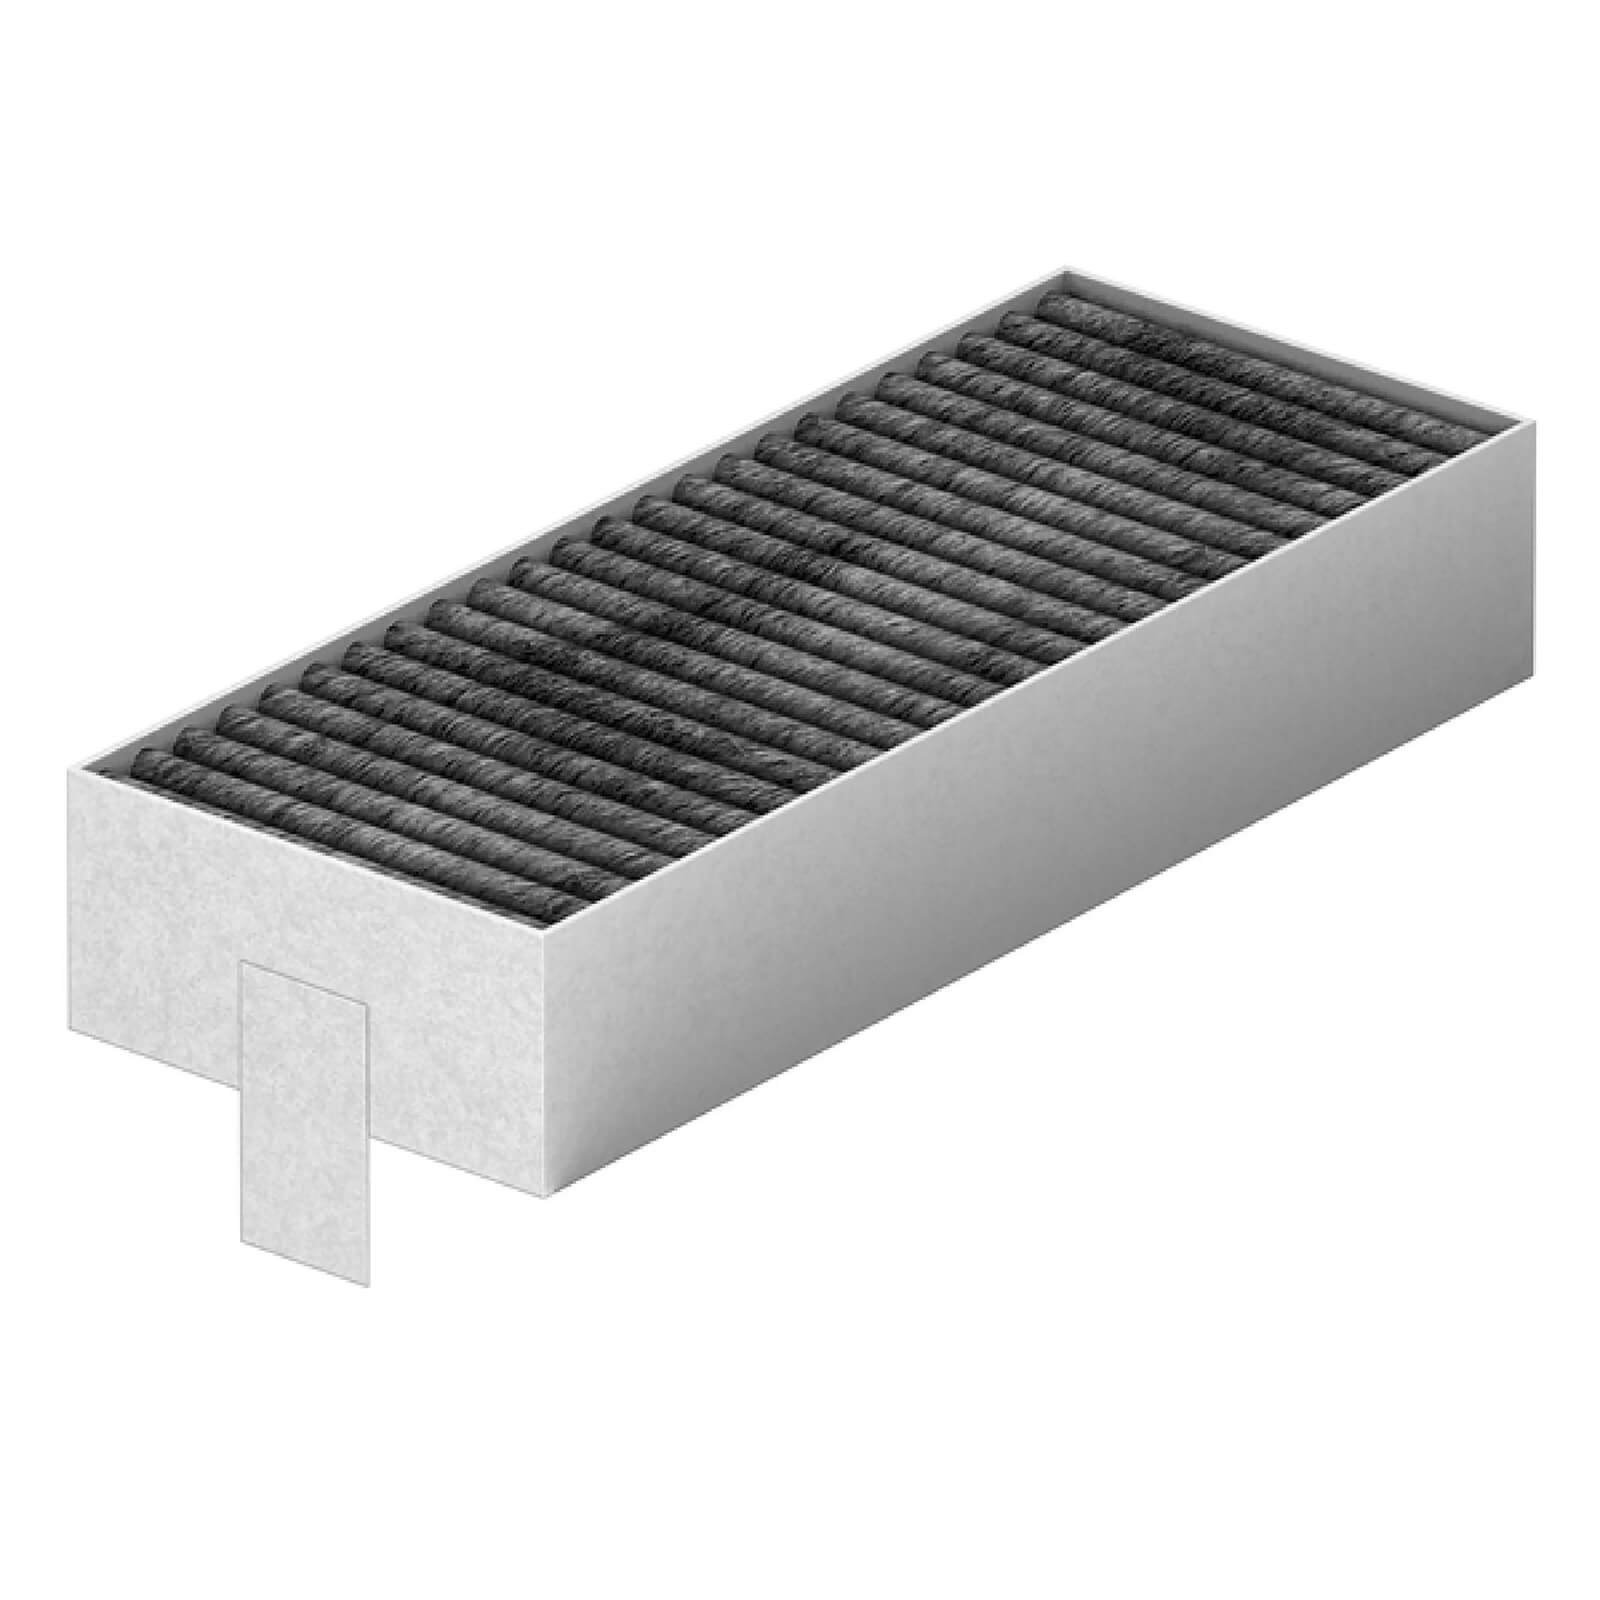 Bosch HEZ9VRUD0 Unducted Recirculation Kit